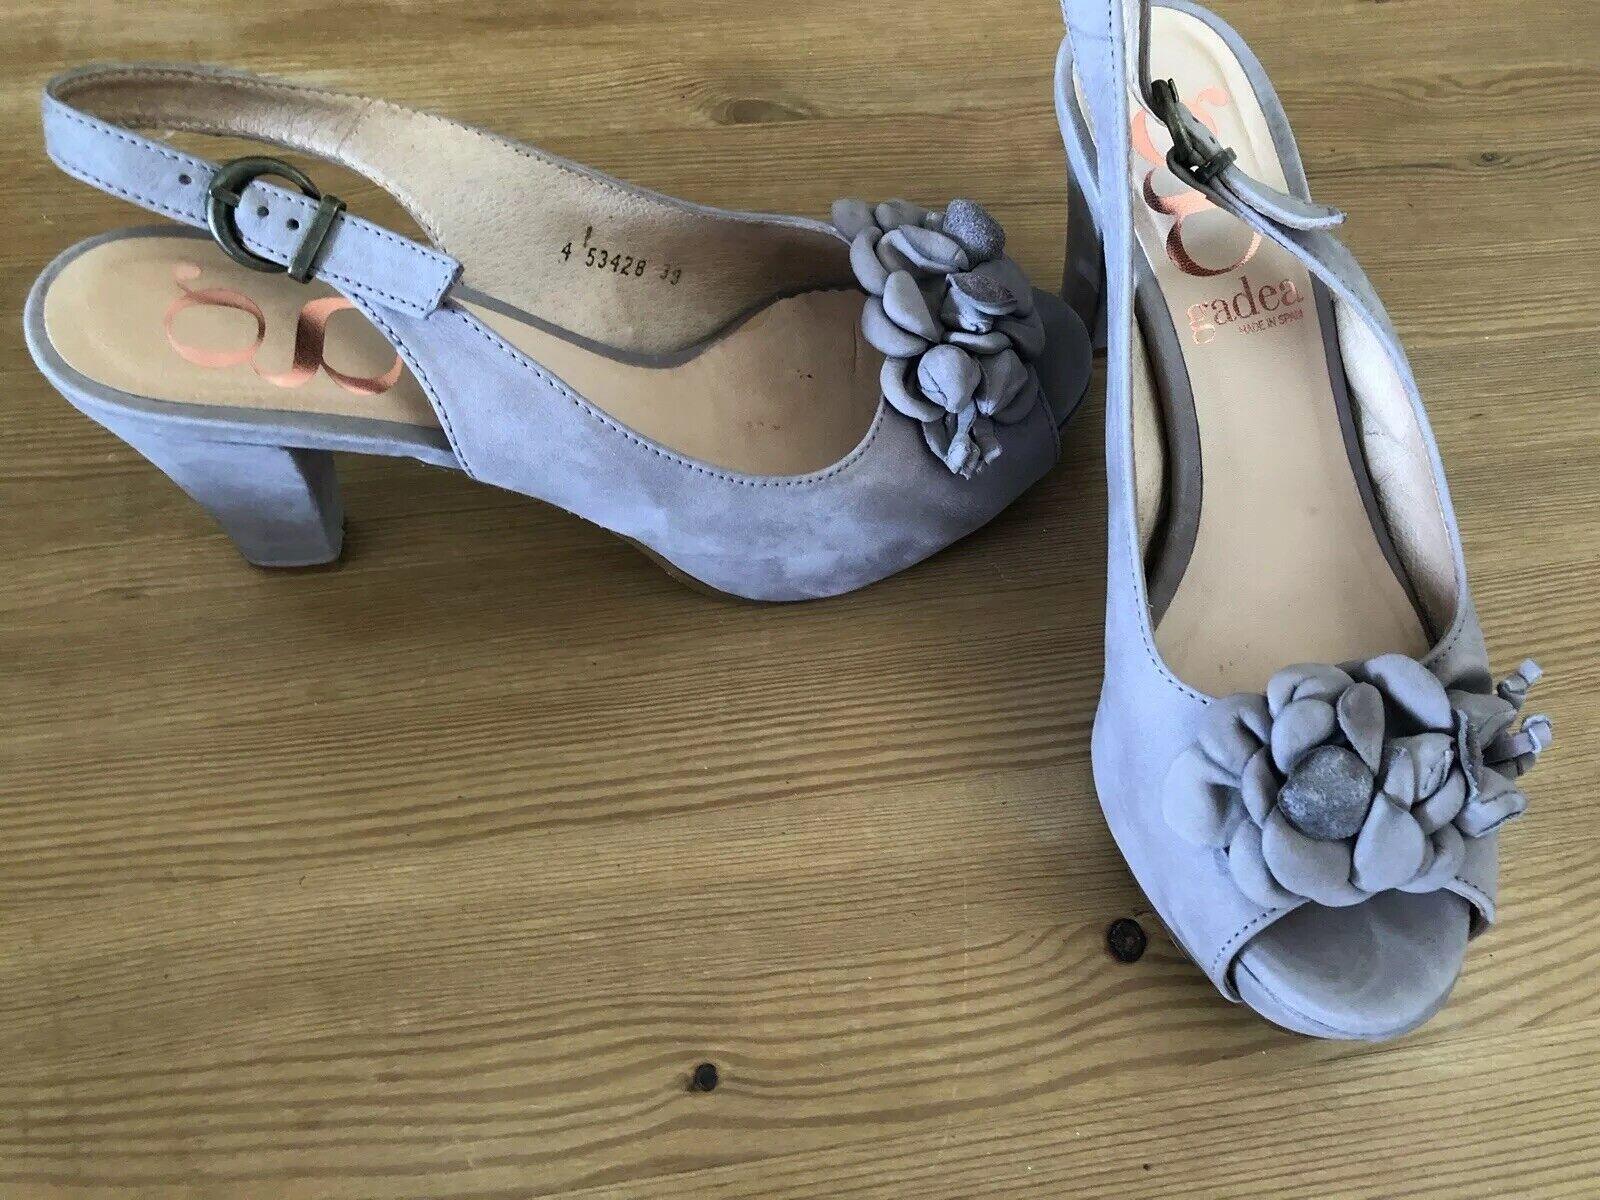 Kaufen Gadea Halbschuhe Ballerinas Damen Schuhe Braun(Taupe